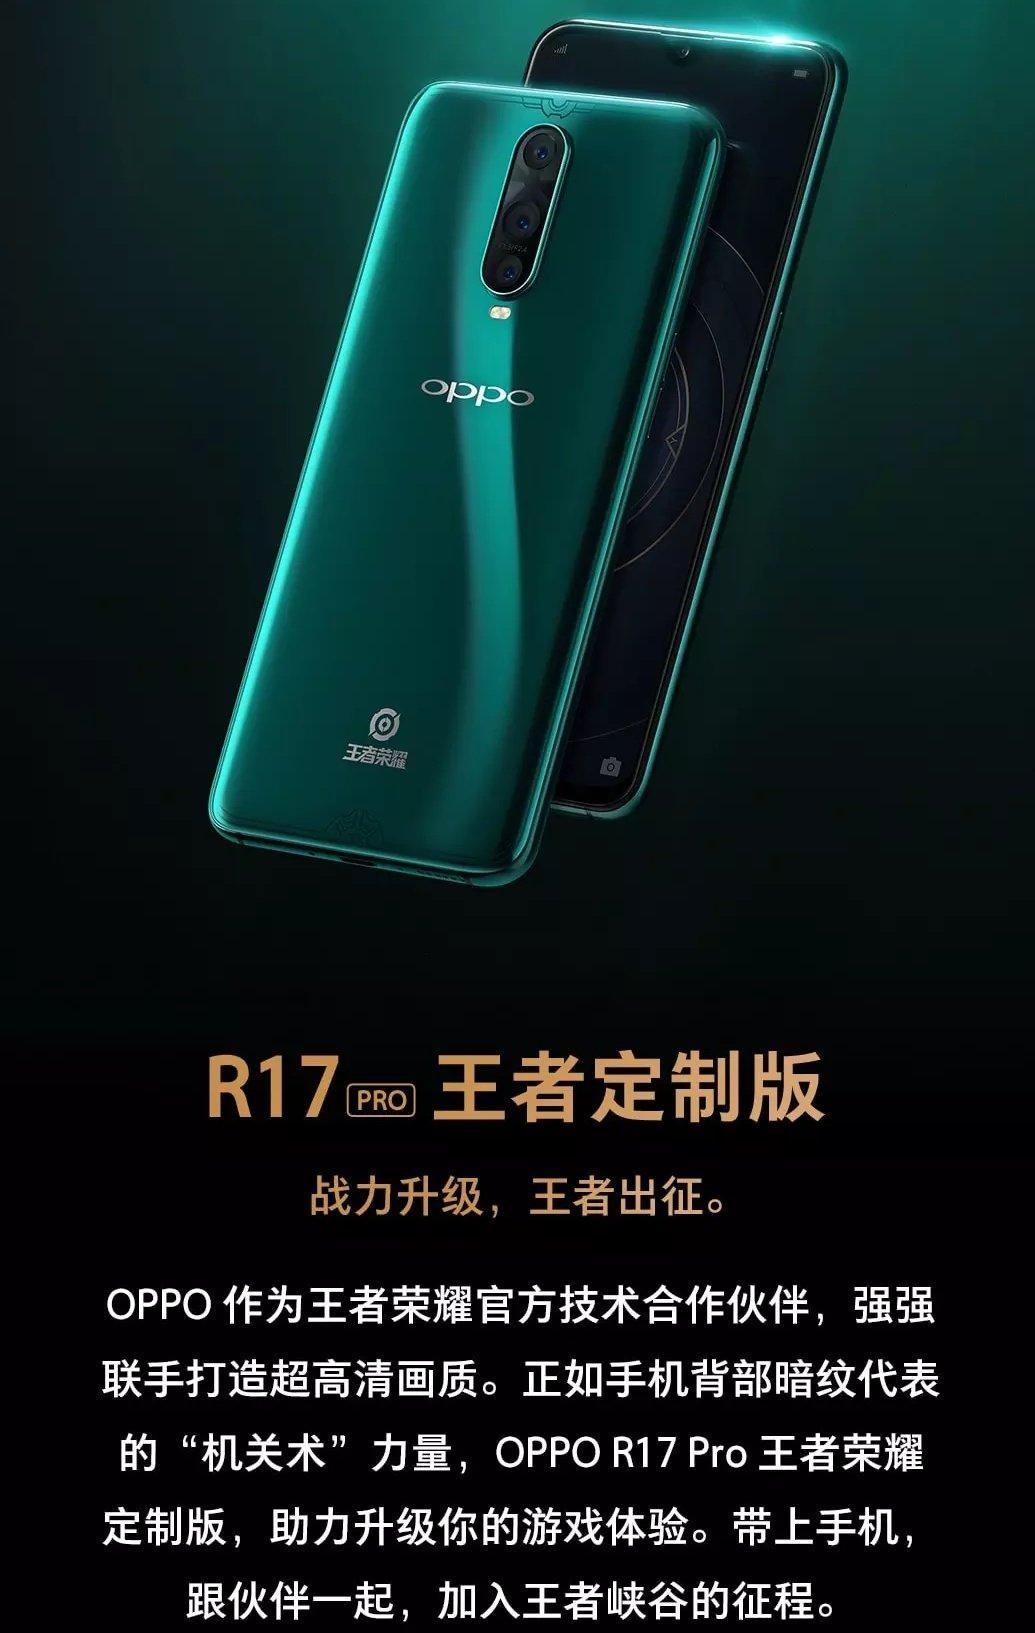 OPPO R17 Pro King Custom Edition Open Registration : 4299 yuan 1